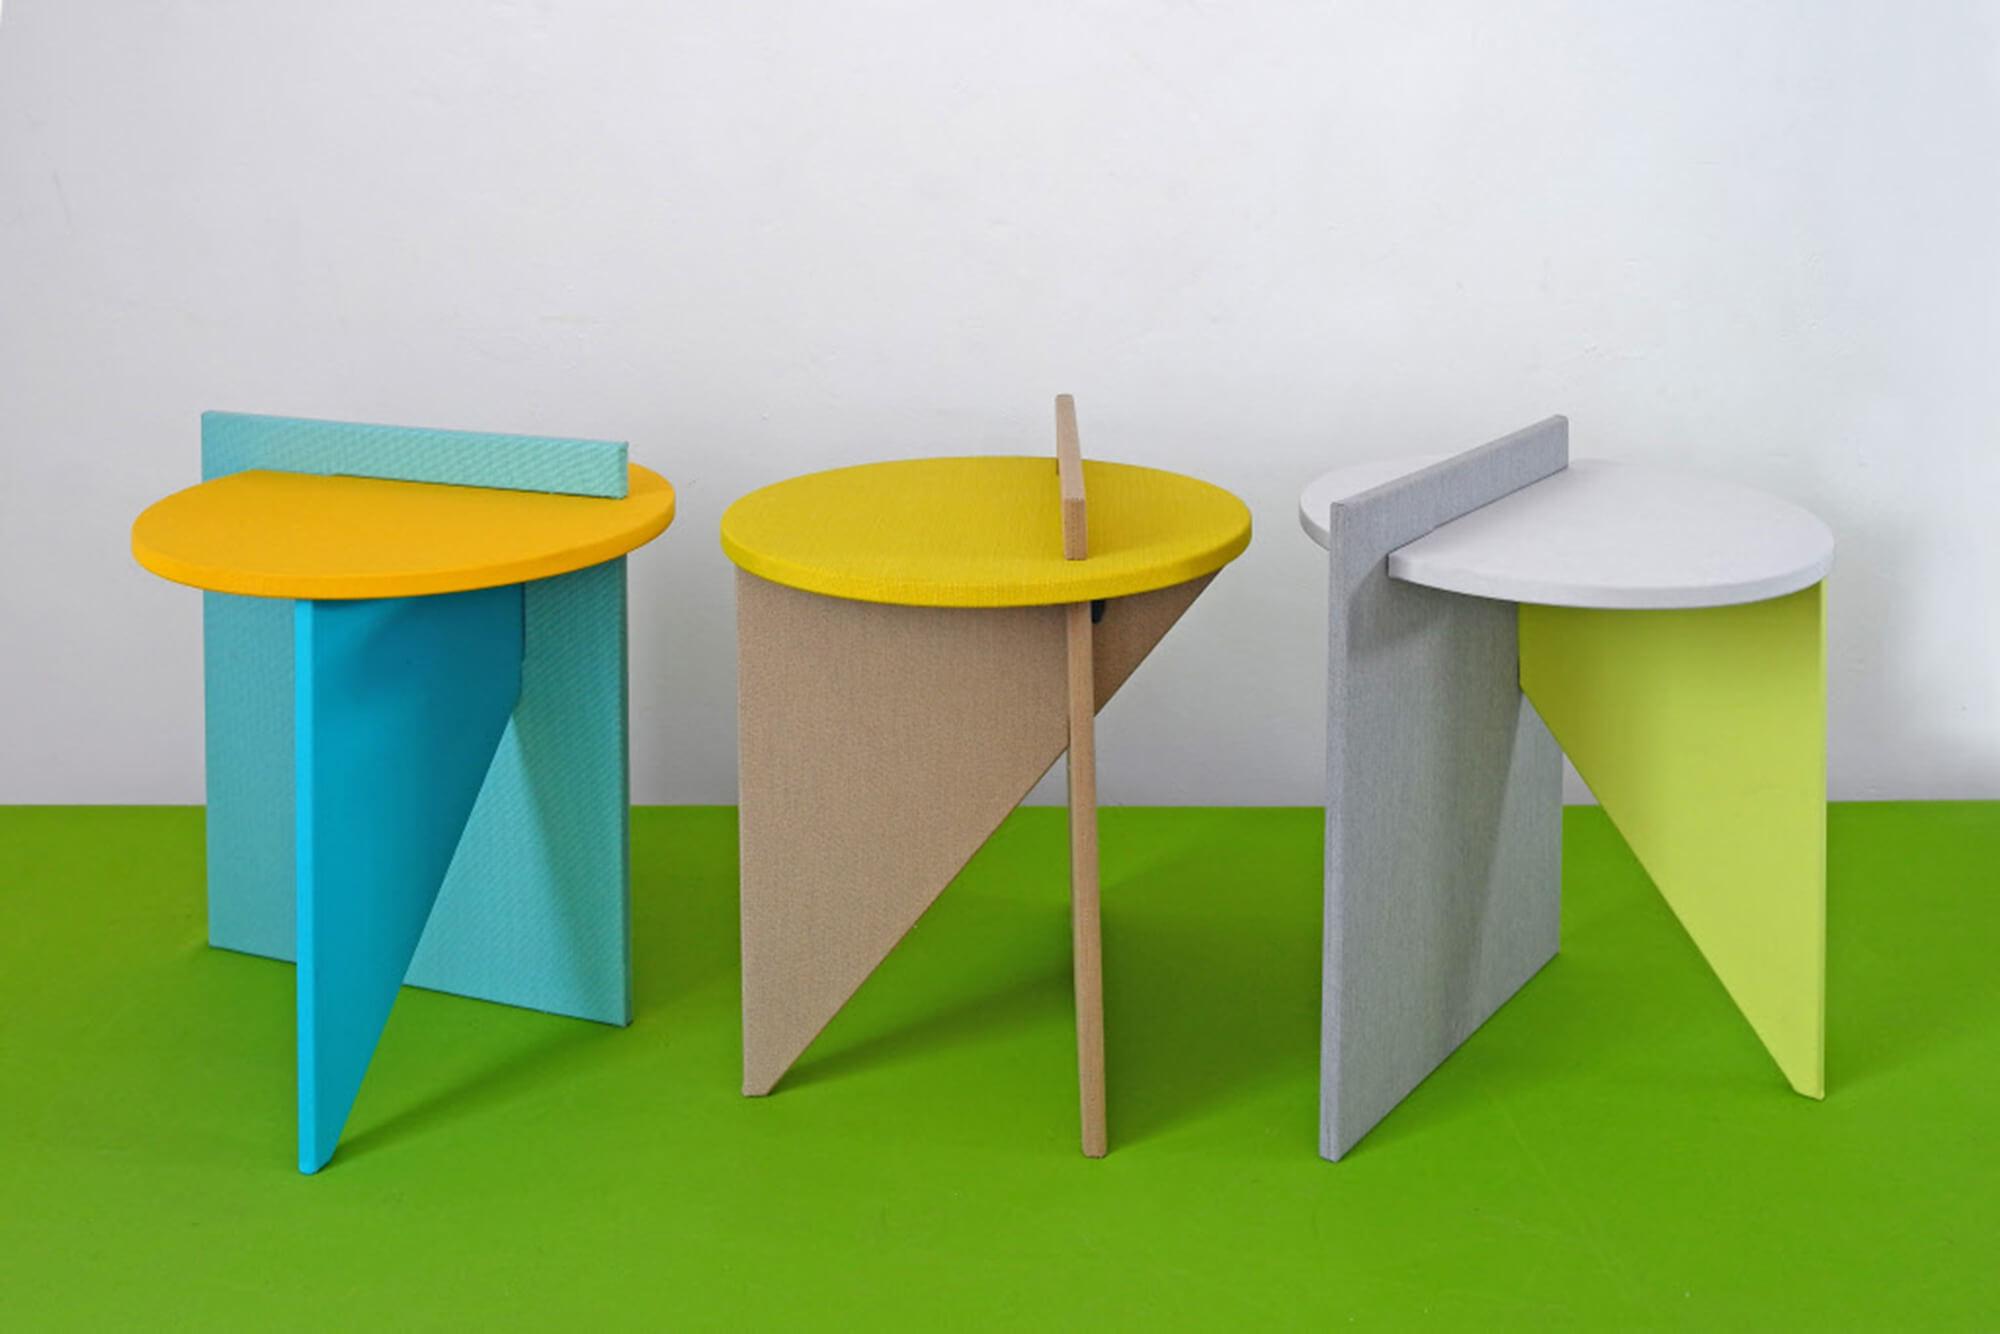 Atelier Lavit 设计的蓝黄绿色边桌